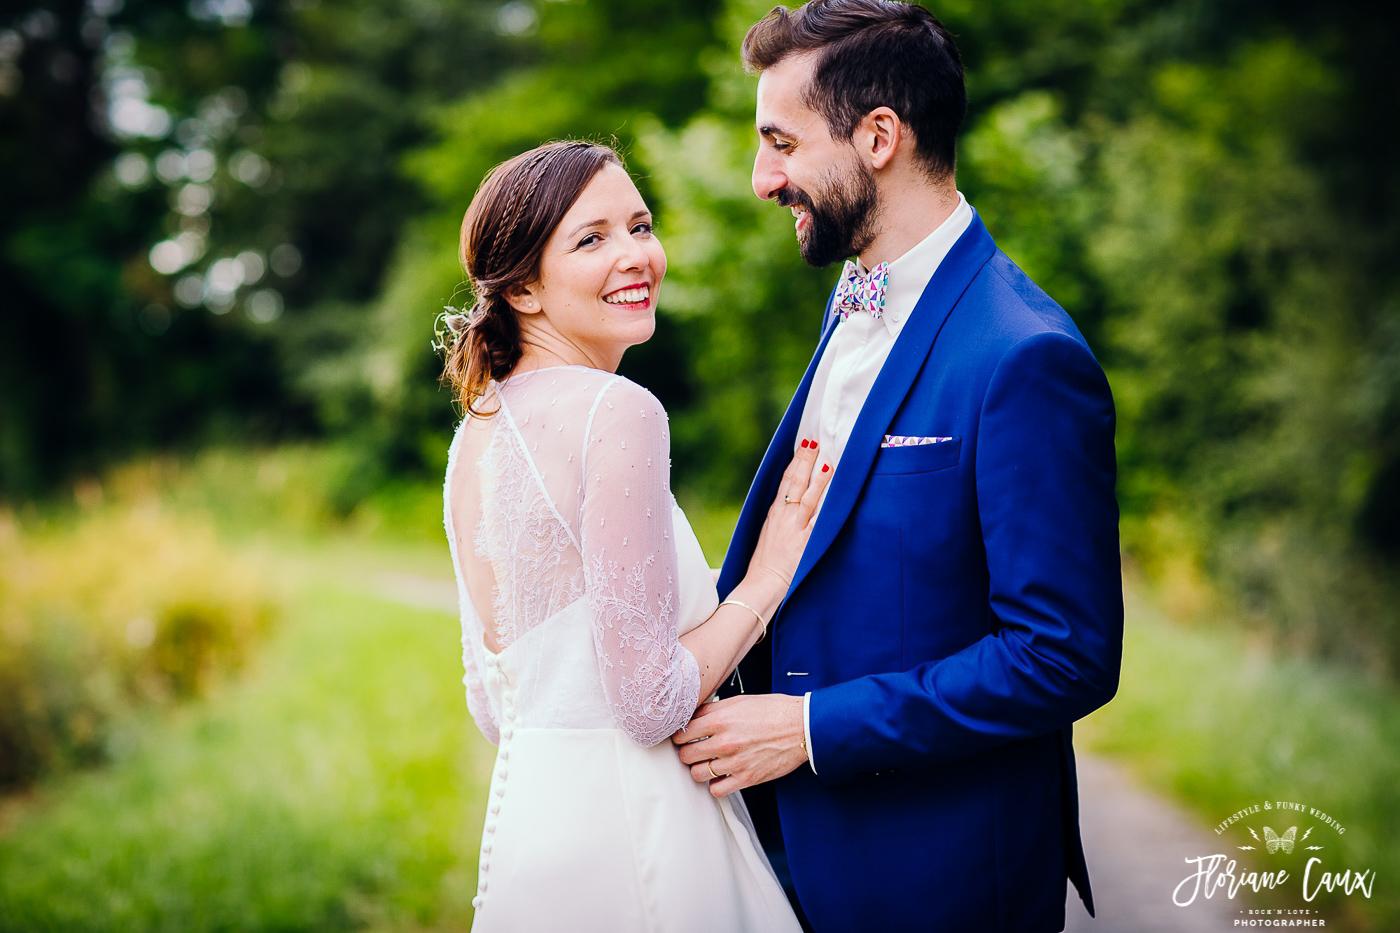 photographe-mariage-pays-basque-Floriane-Caux (43)